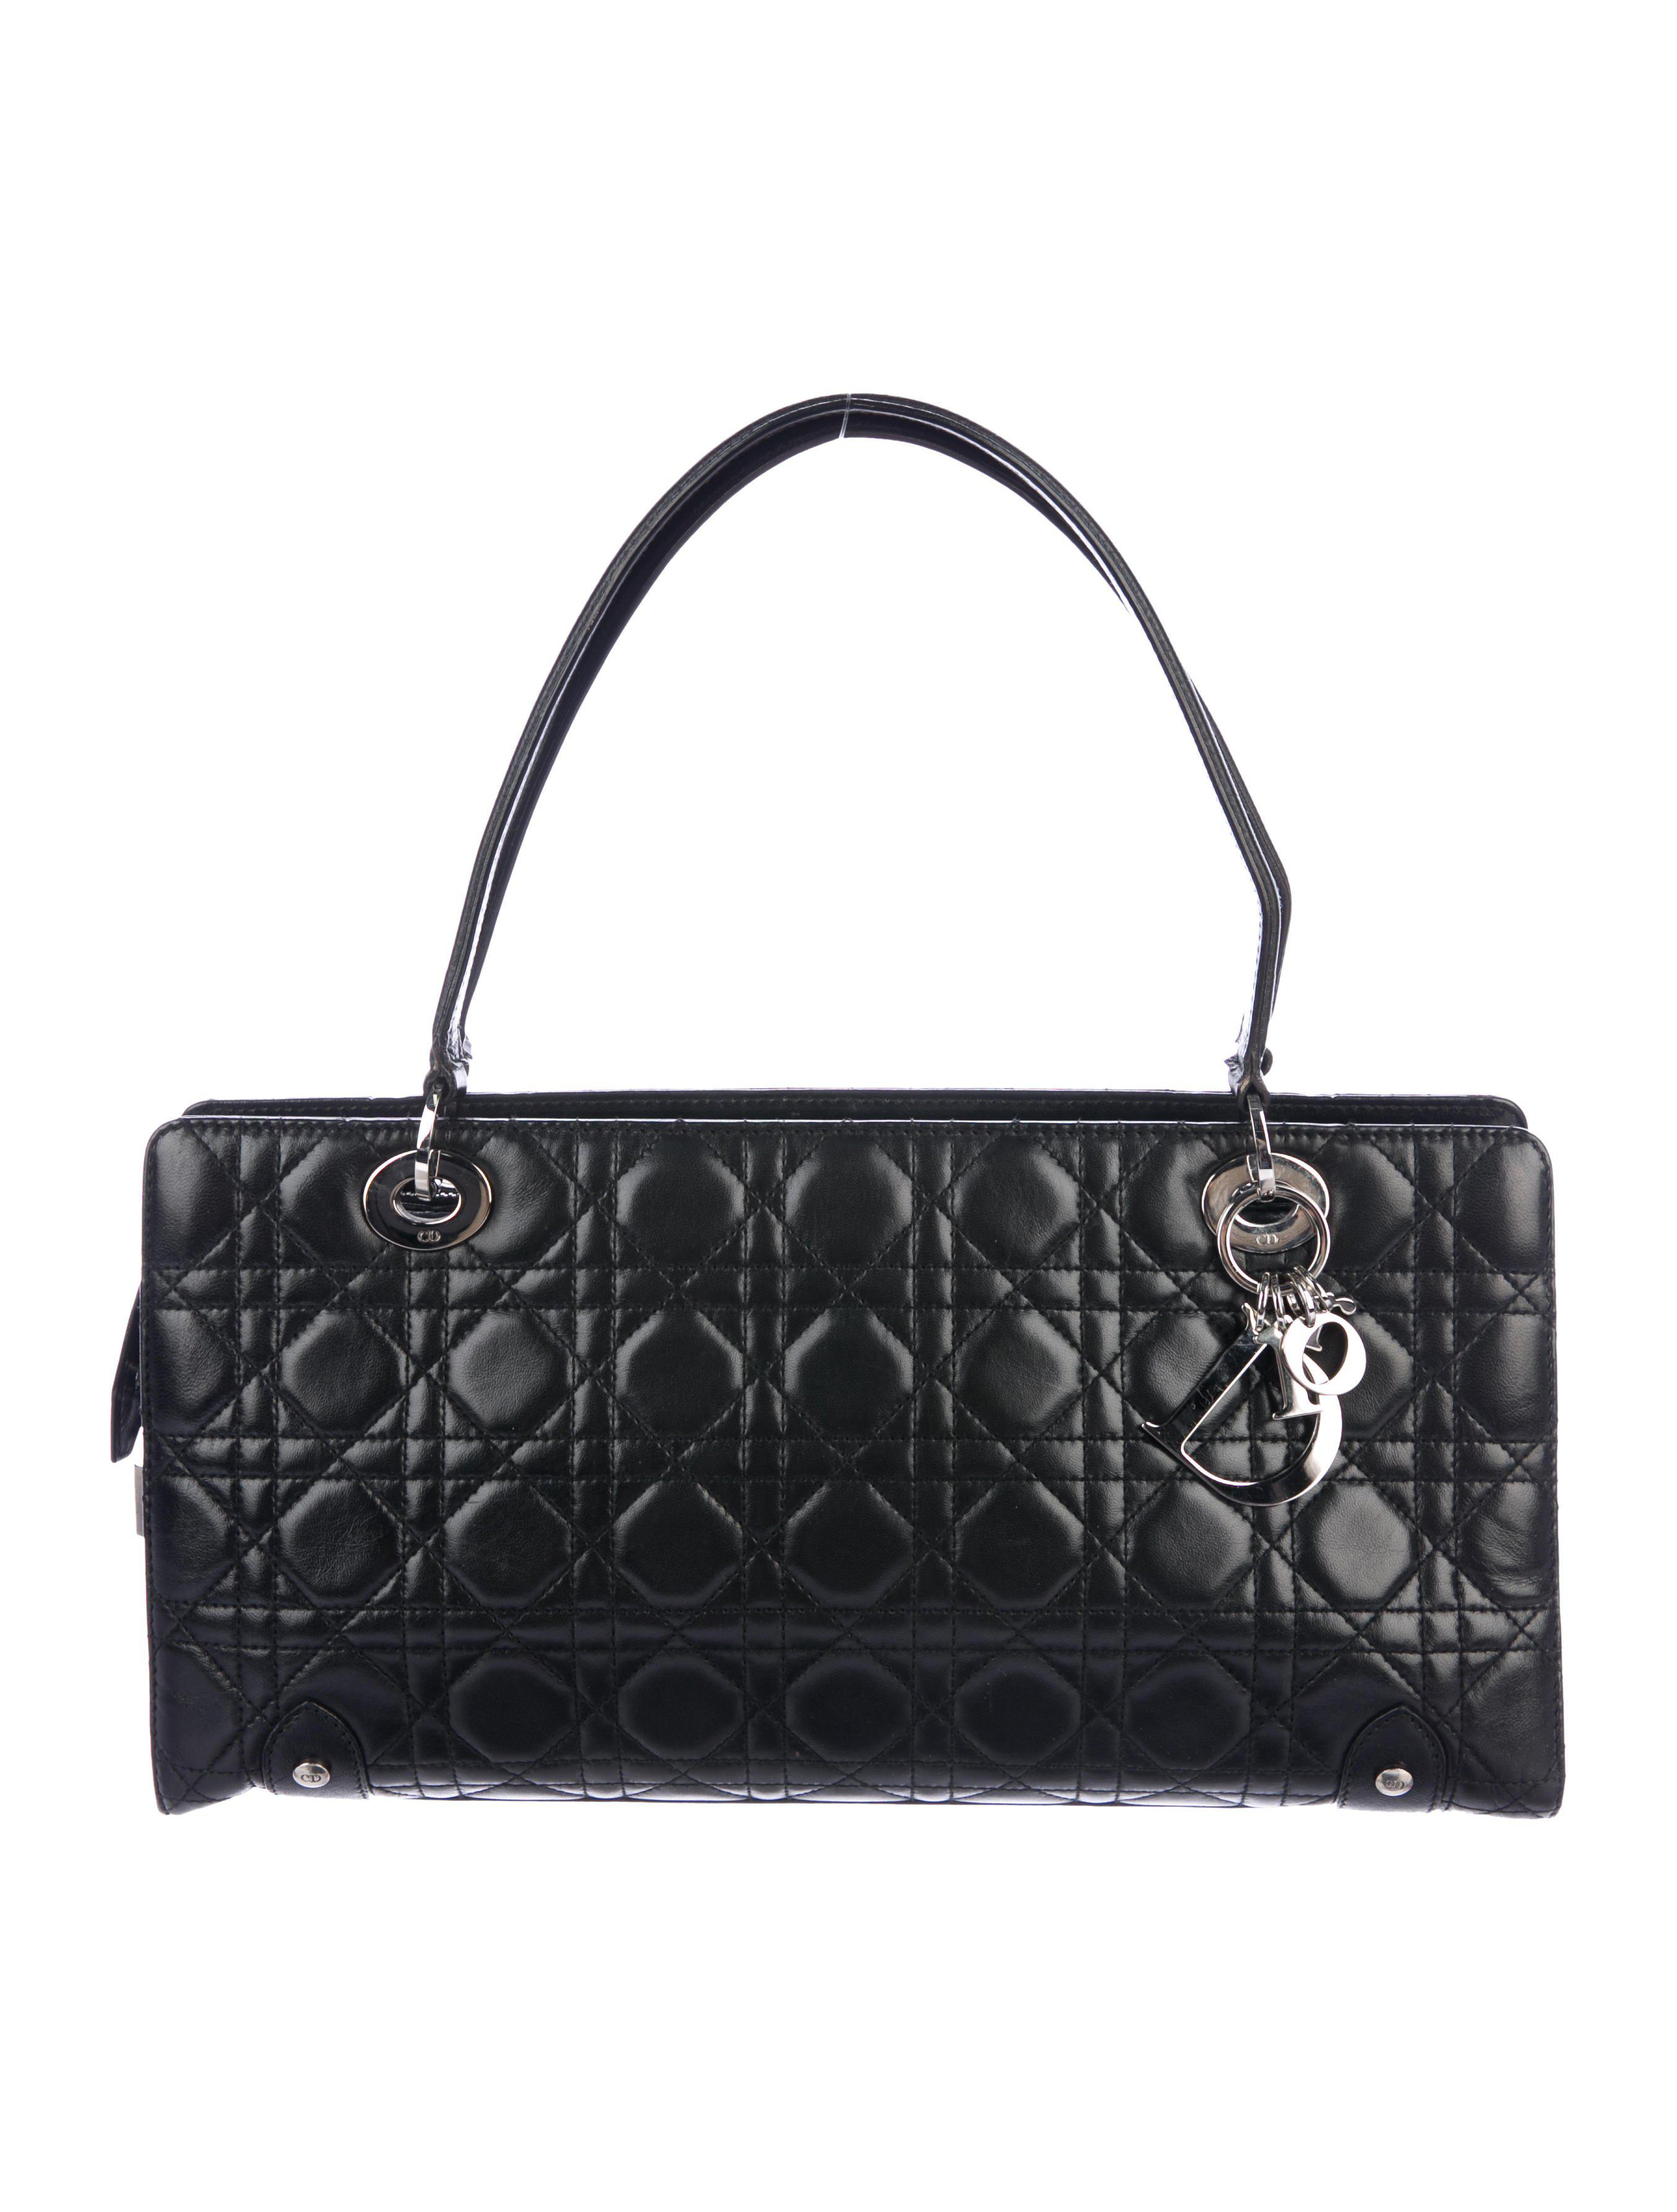 7ce7f81ece16 Lyst - Dior Cannage Shoulder Bag Black in Metallic